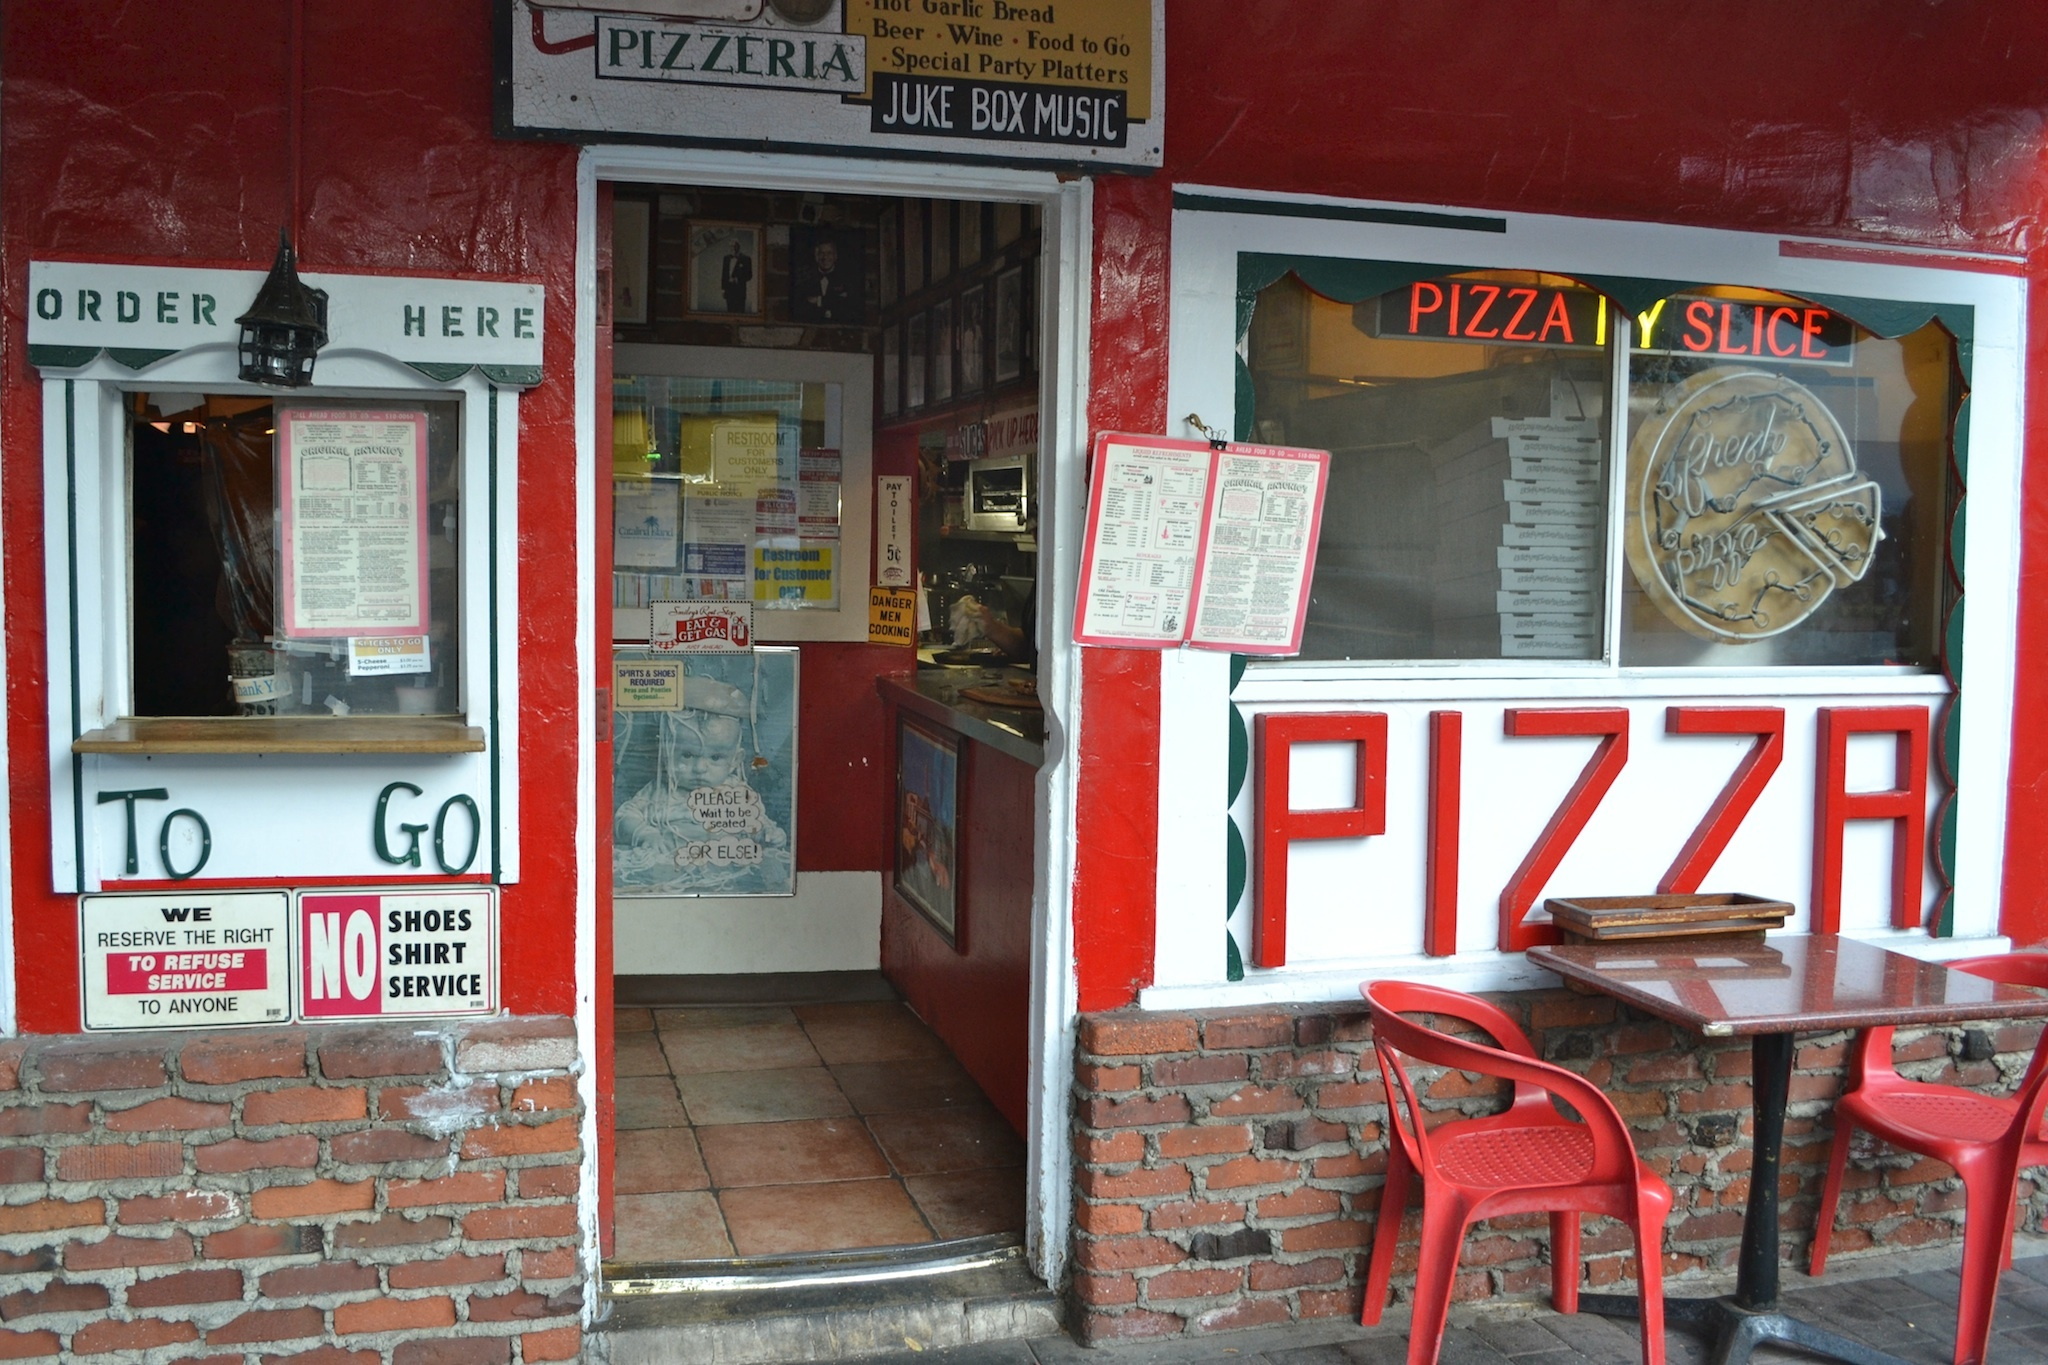 Antonio's Pizzeria & Deli